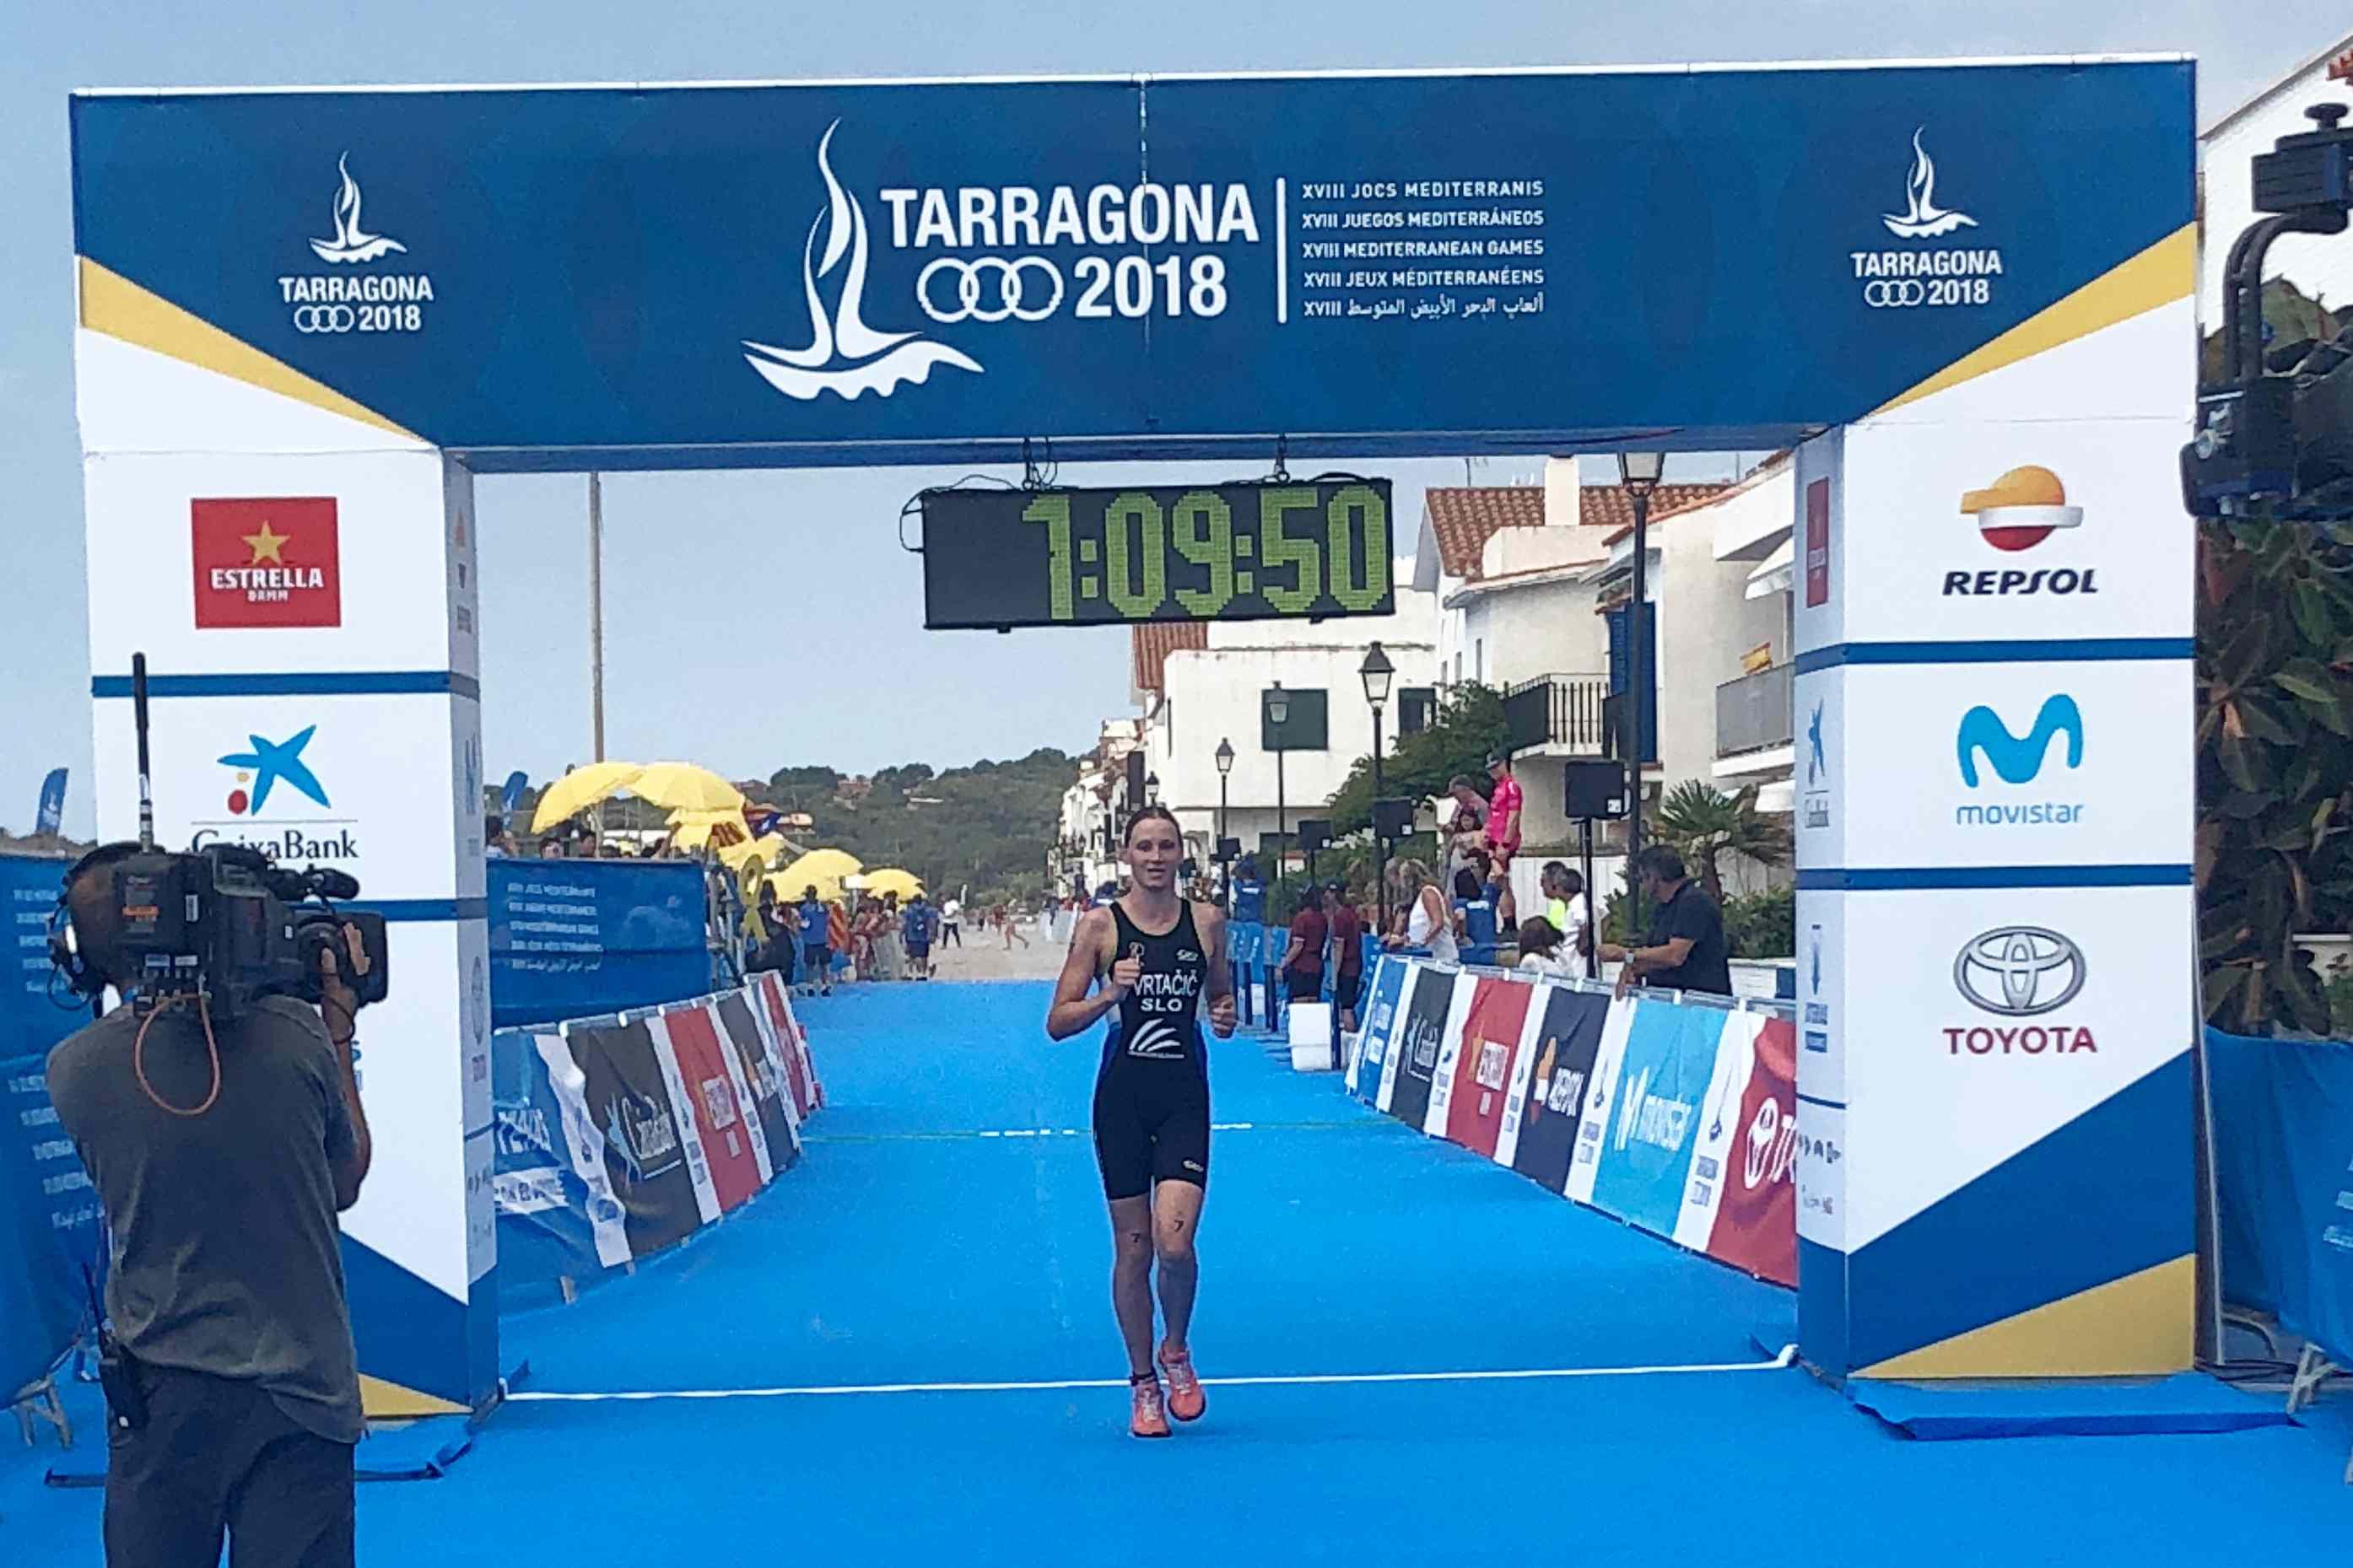 Tarragona 2018 Vrtacic